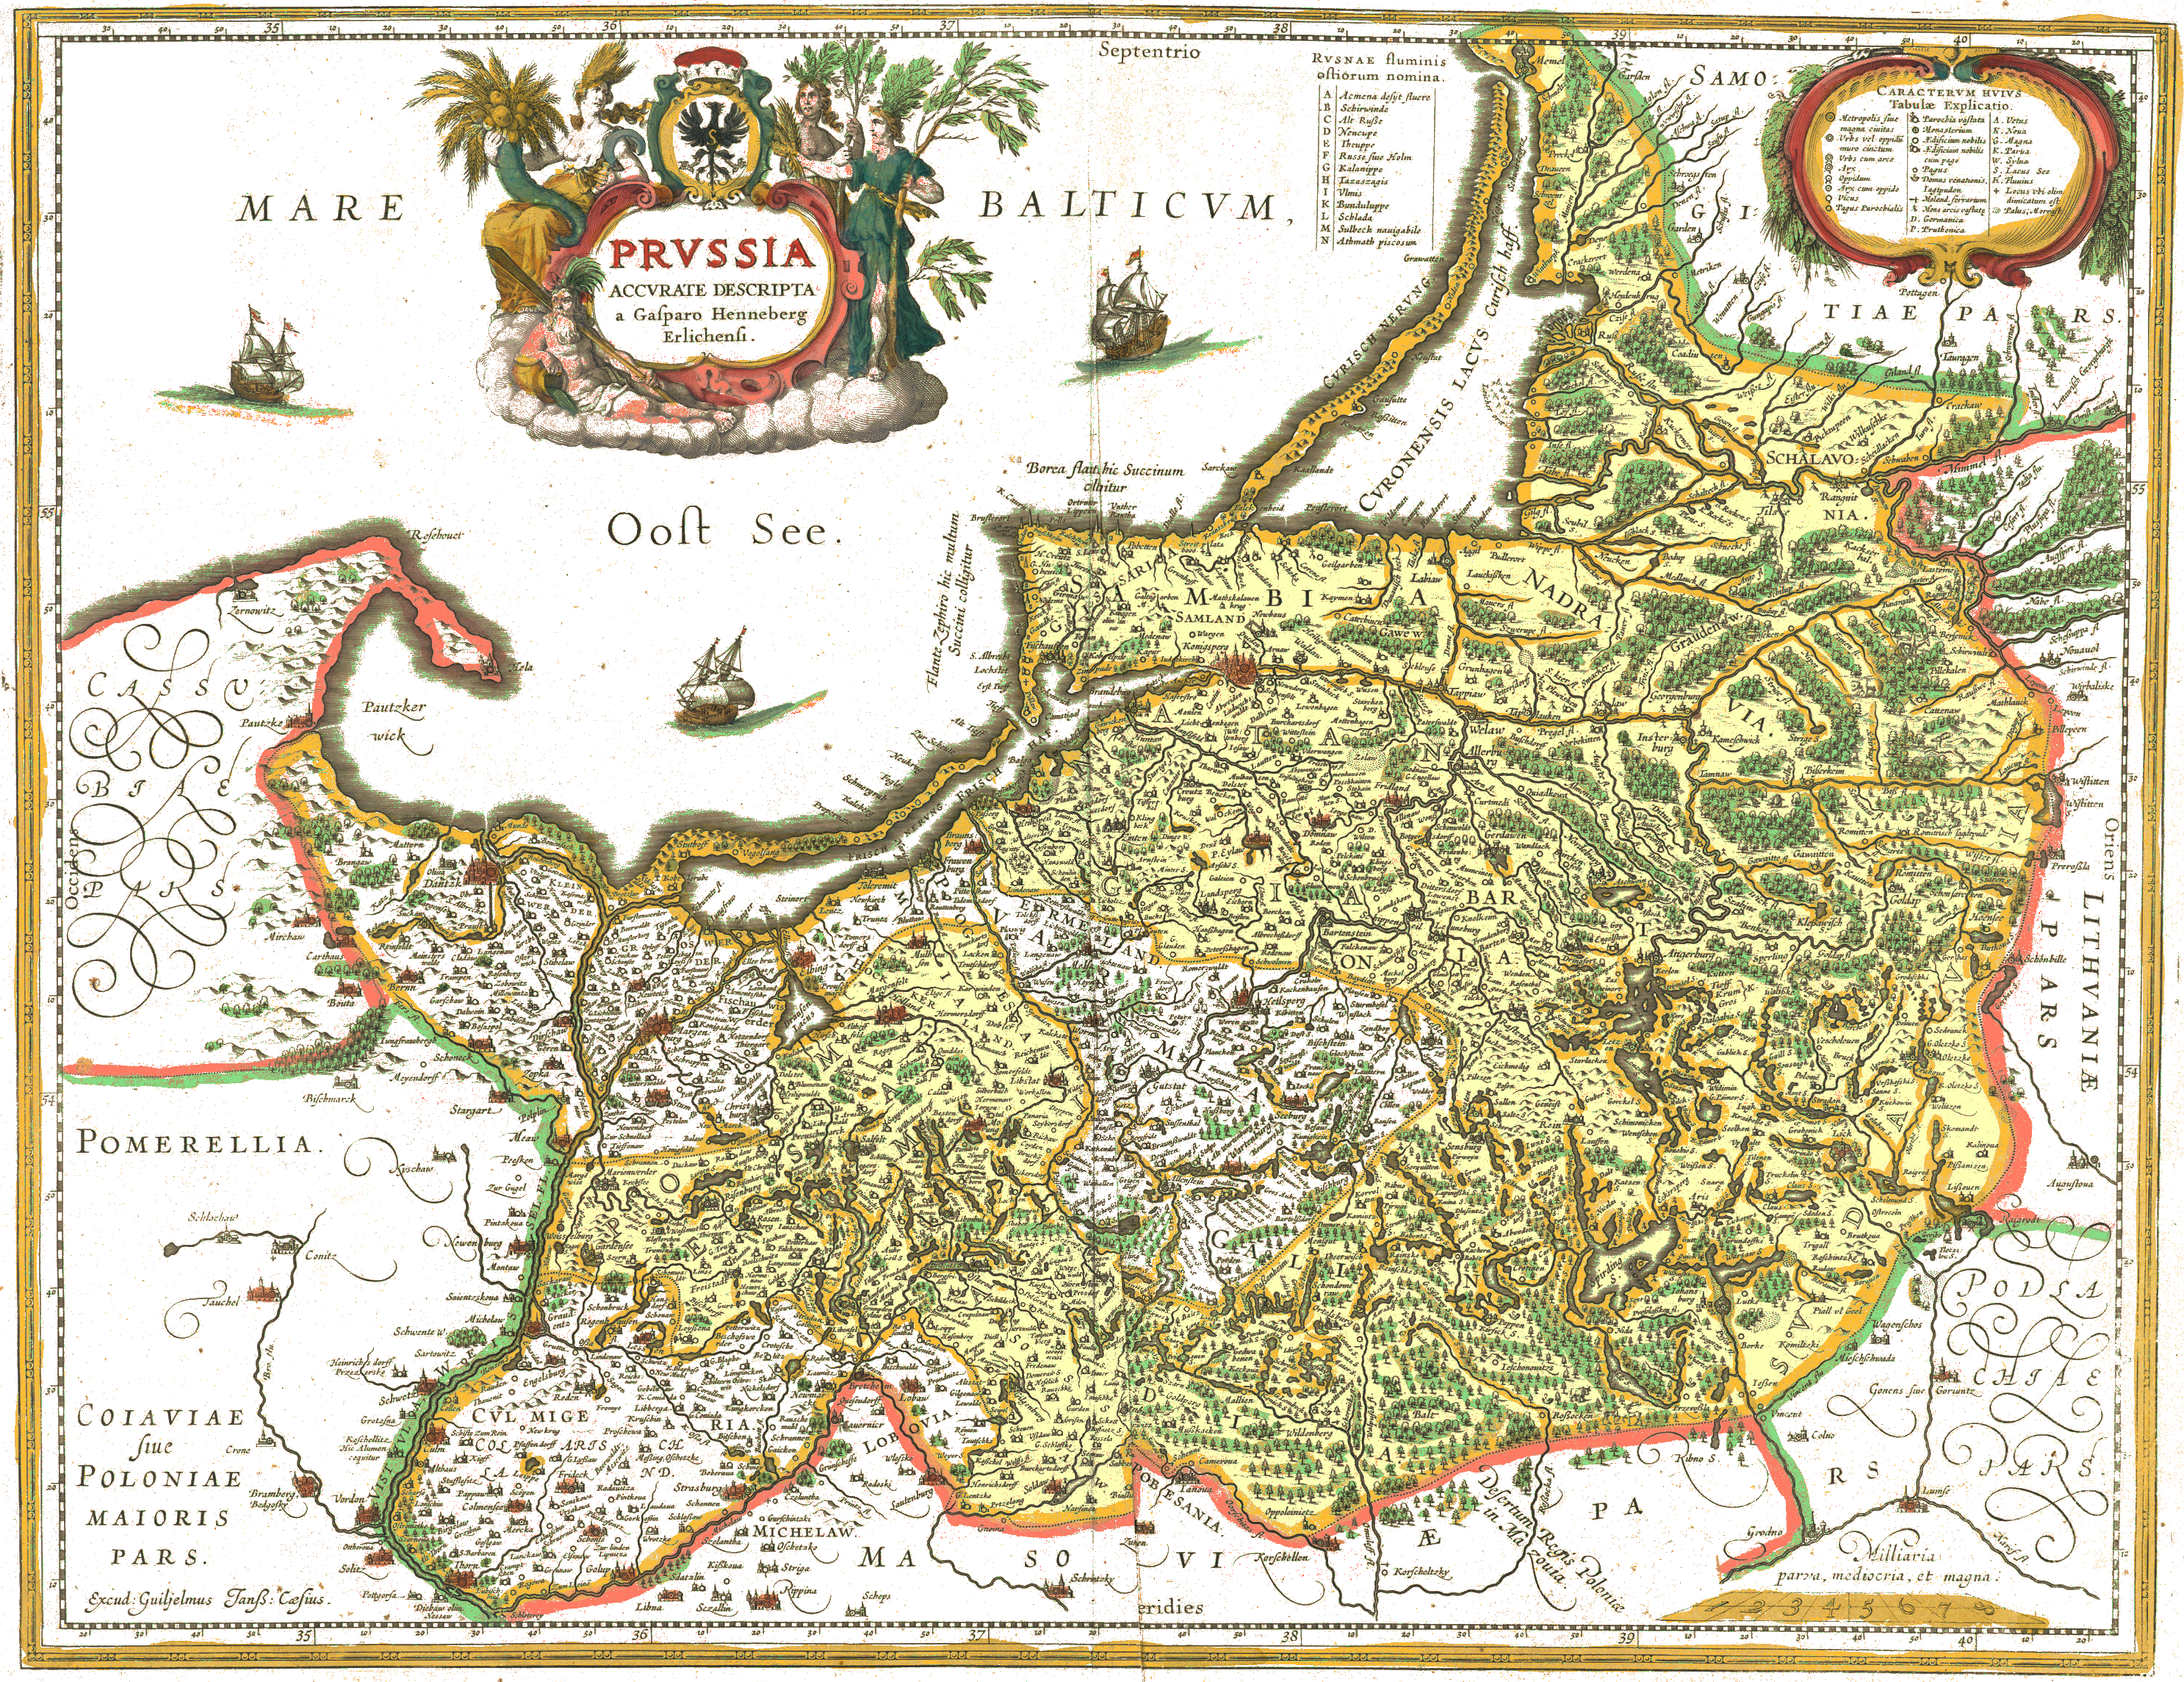 Karte Iran Nachbarlander.Vaizdas Prvssia1576casparo Henneberg Png Vikipedija